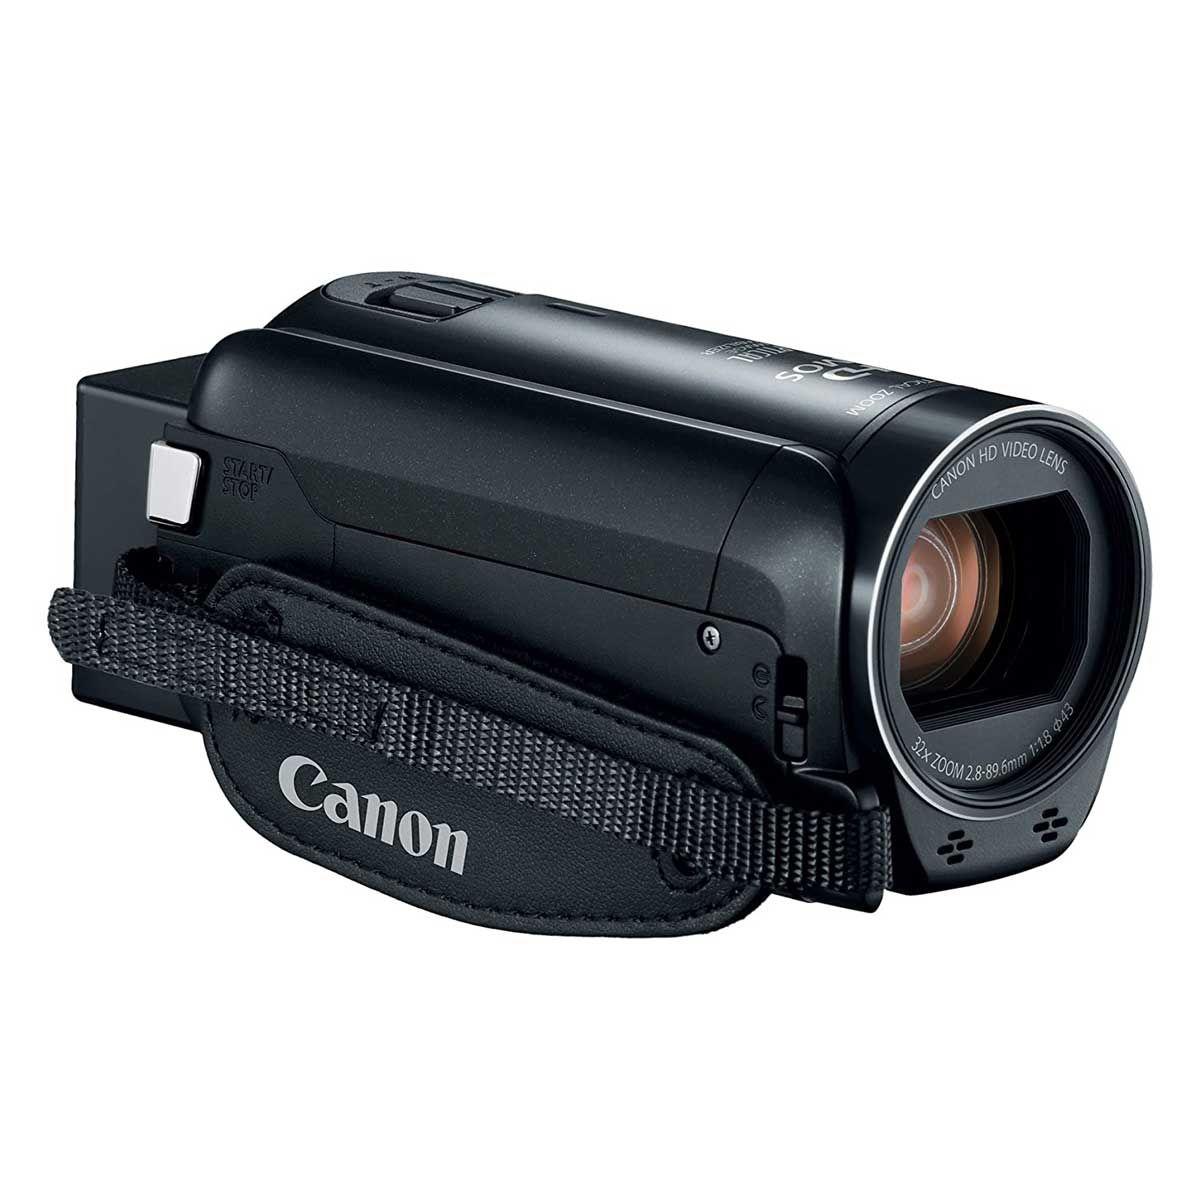 कैनन VIXIA HF R800